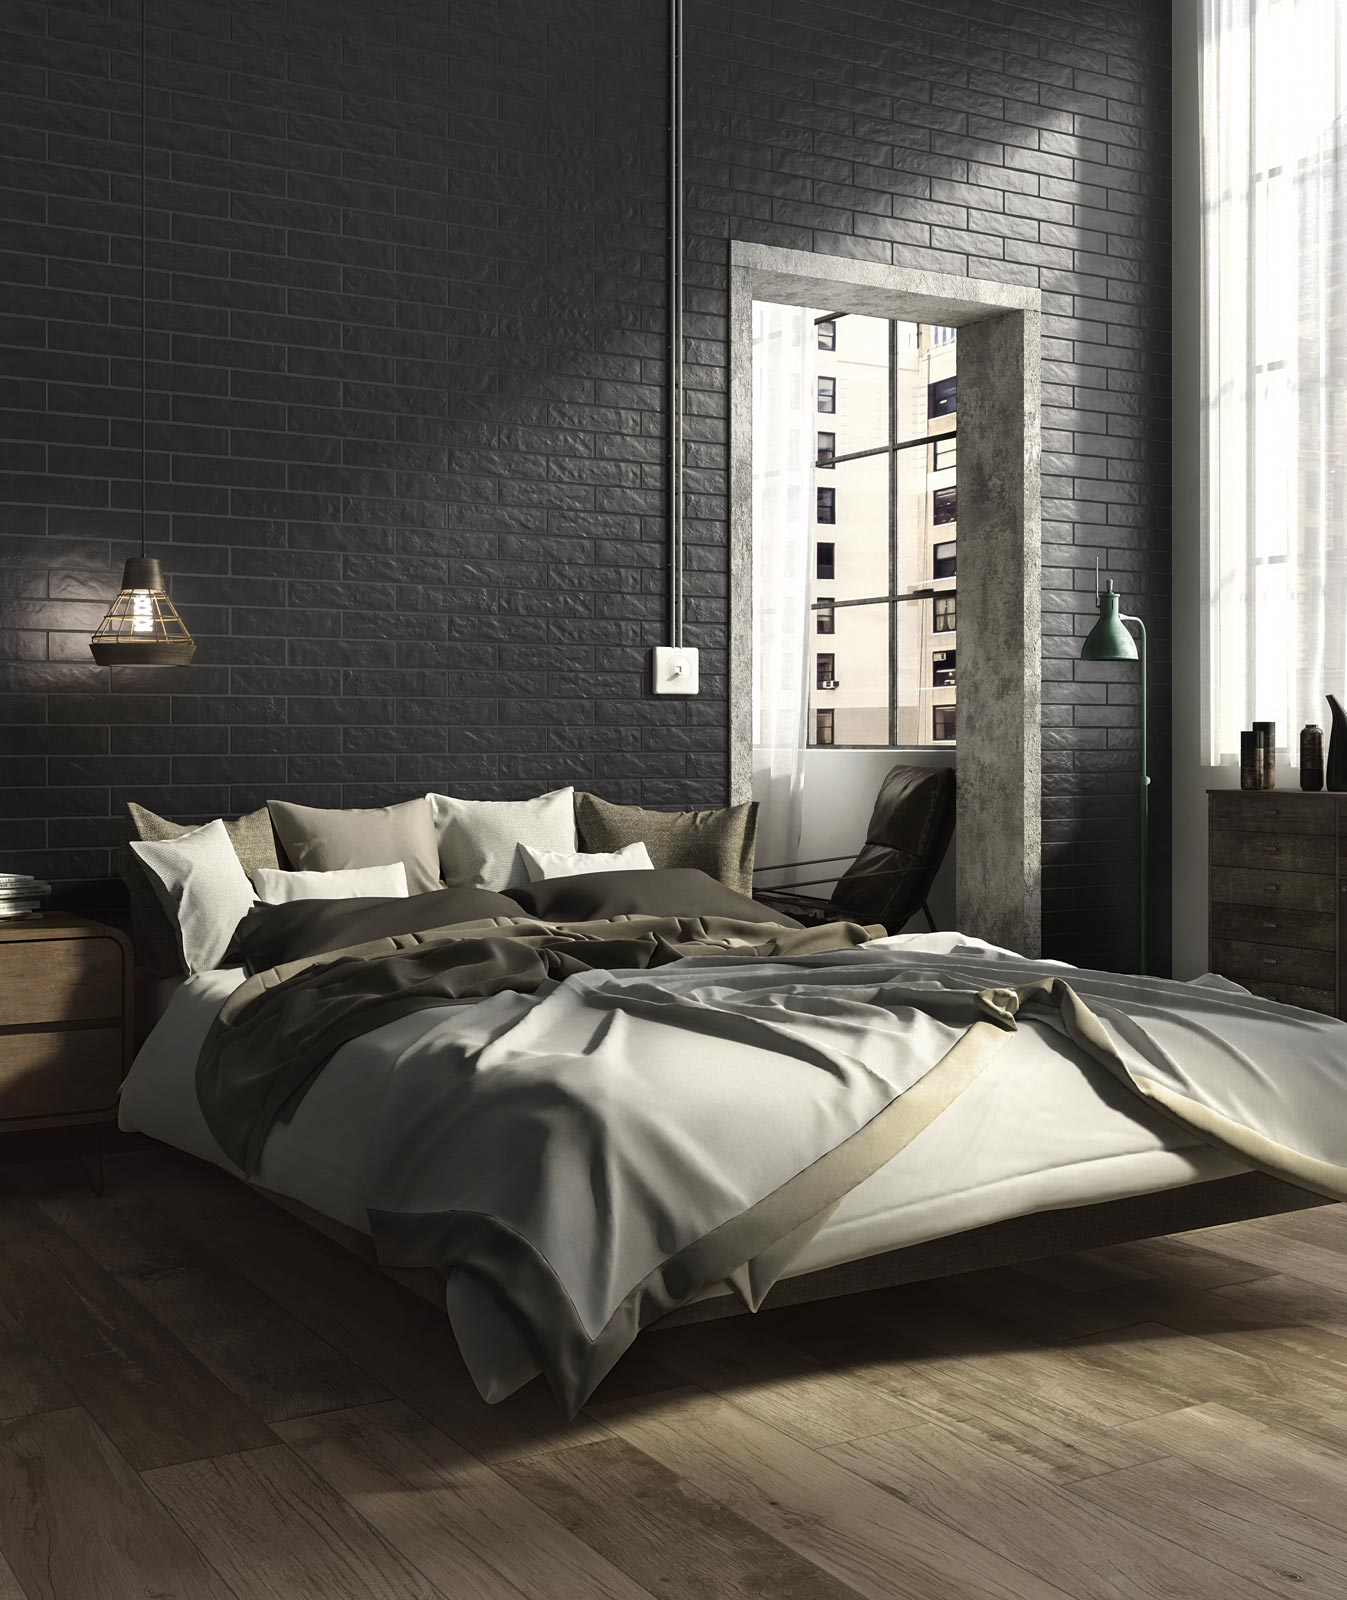 bedroom tiles. Ragno  tiles Bedroom 7915 Tiles Ceramic for the Area